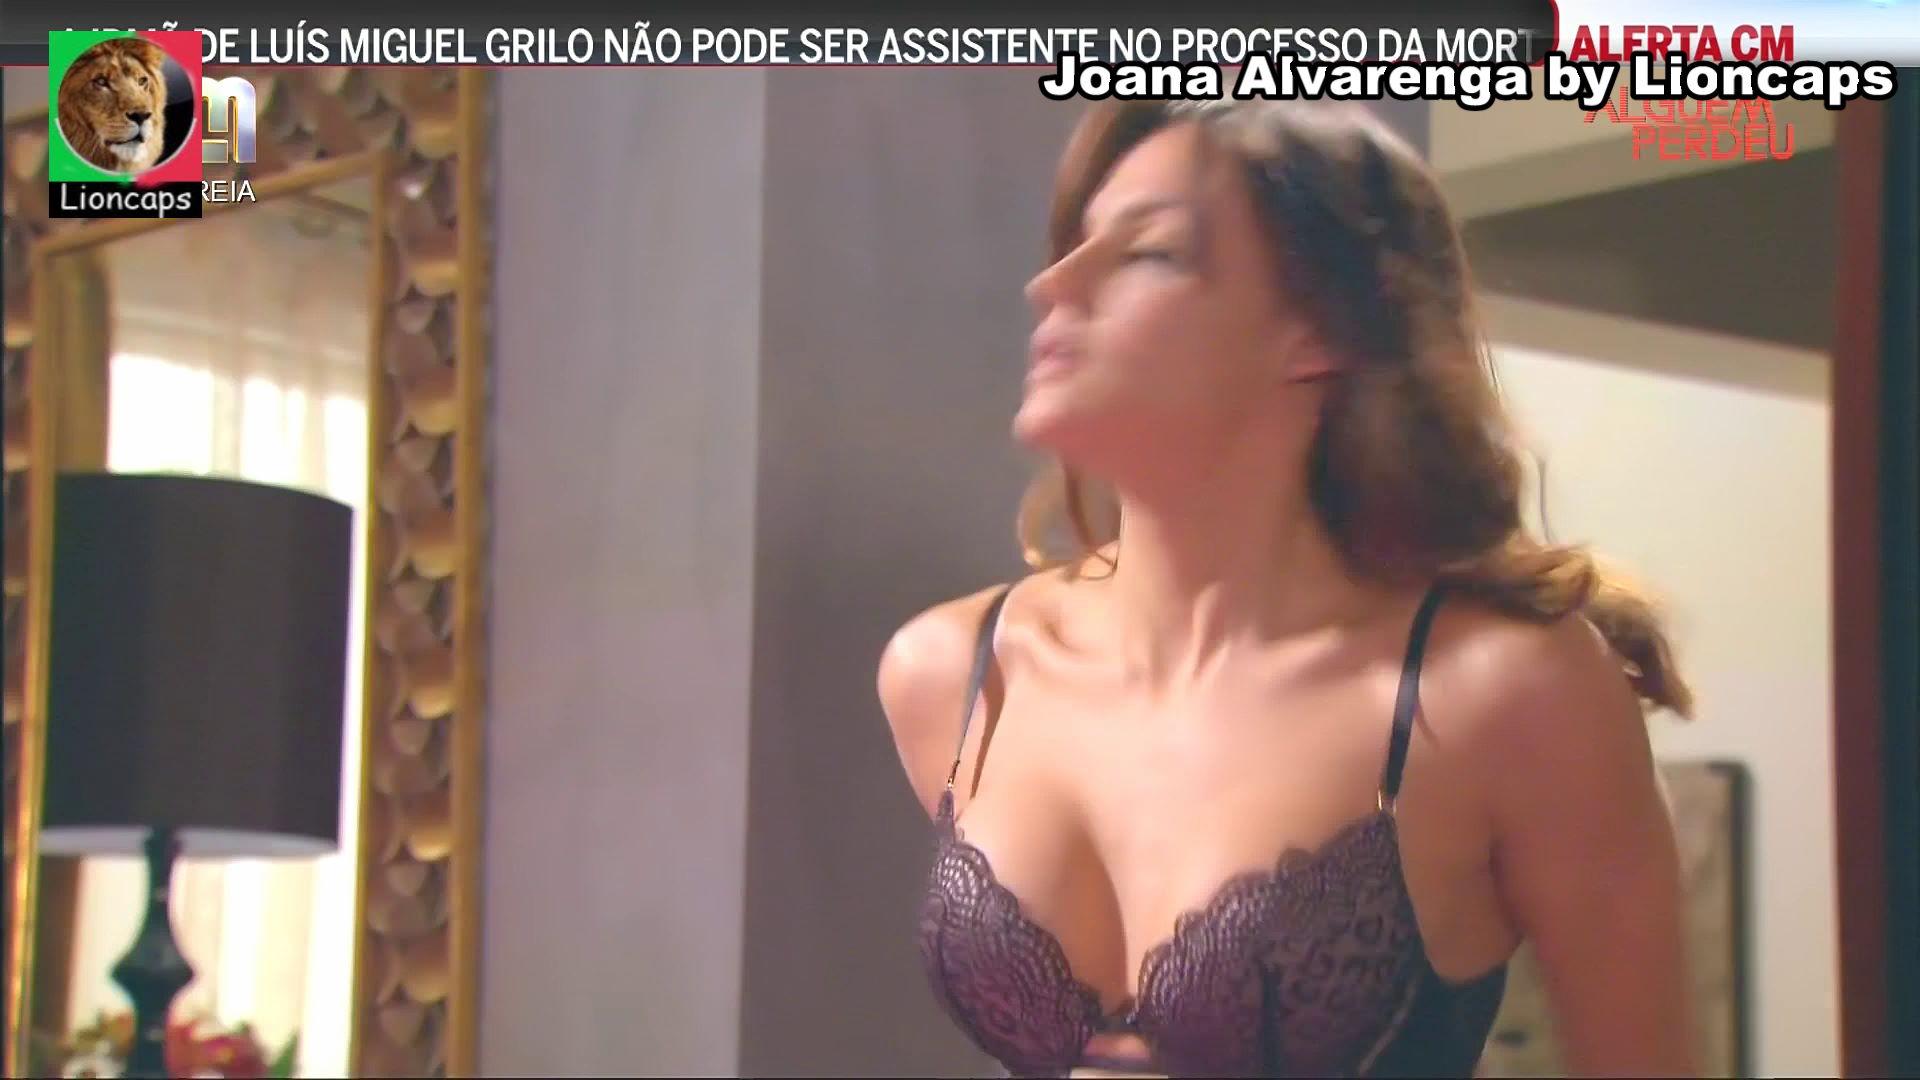 128717810_joana_alvarenga_vs190714_1992_122_568lo.JPG